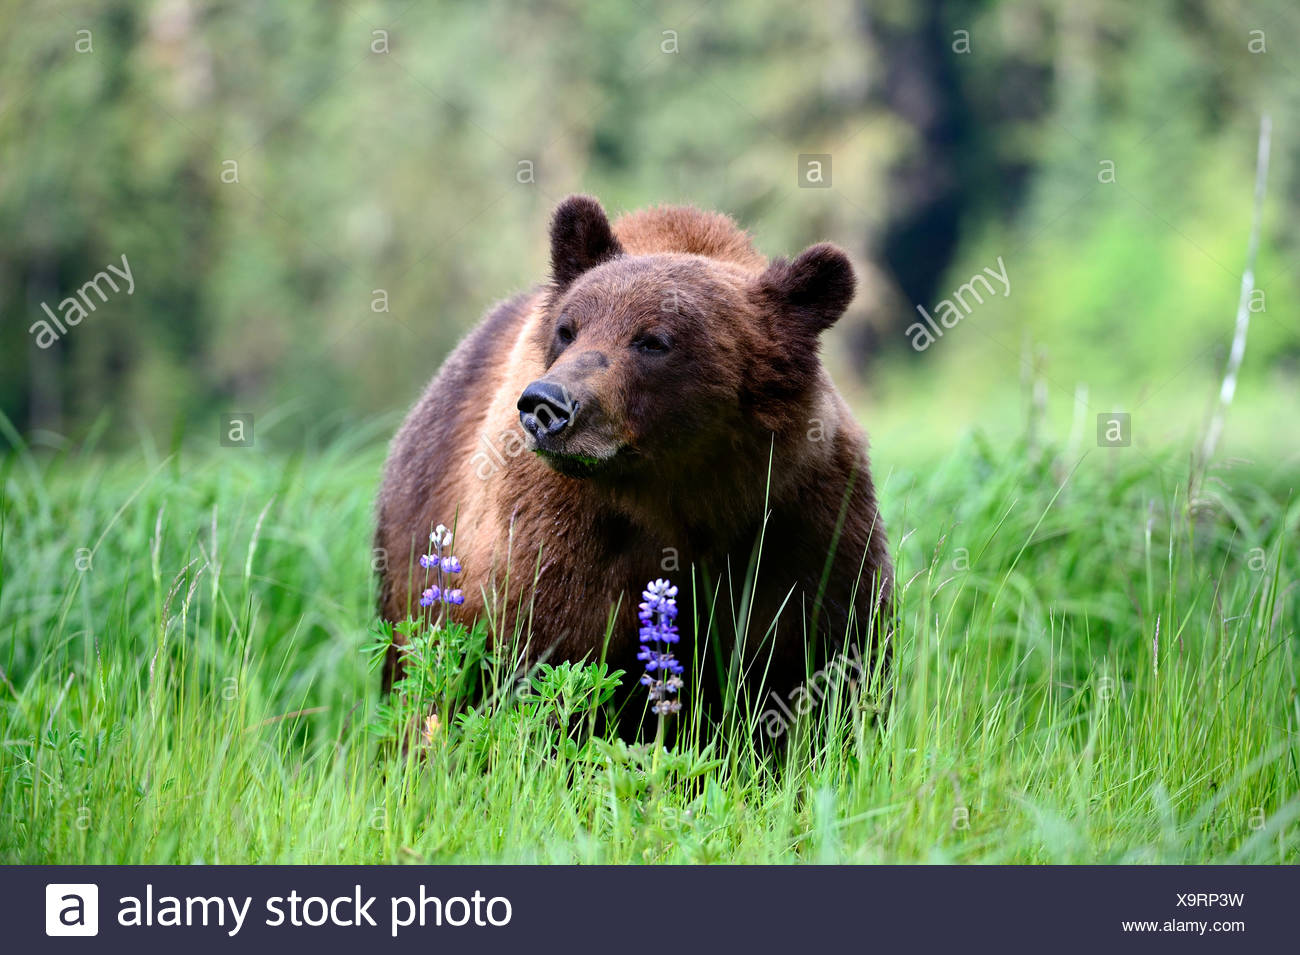 Male Grizzly bear (Ursus arctos horribilis) feeding on Nootka lupine. Khutzeymateen Grizzly Bear Sanctuary, British Columbia, Canada. - Stock Image